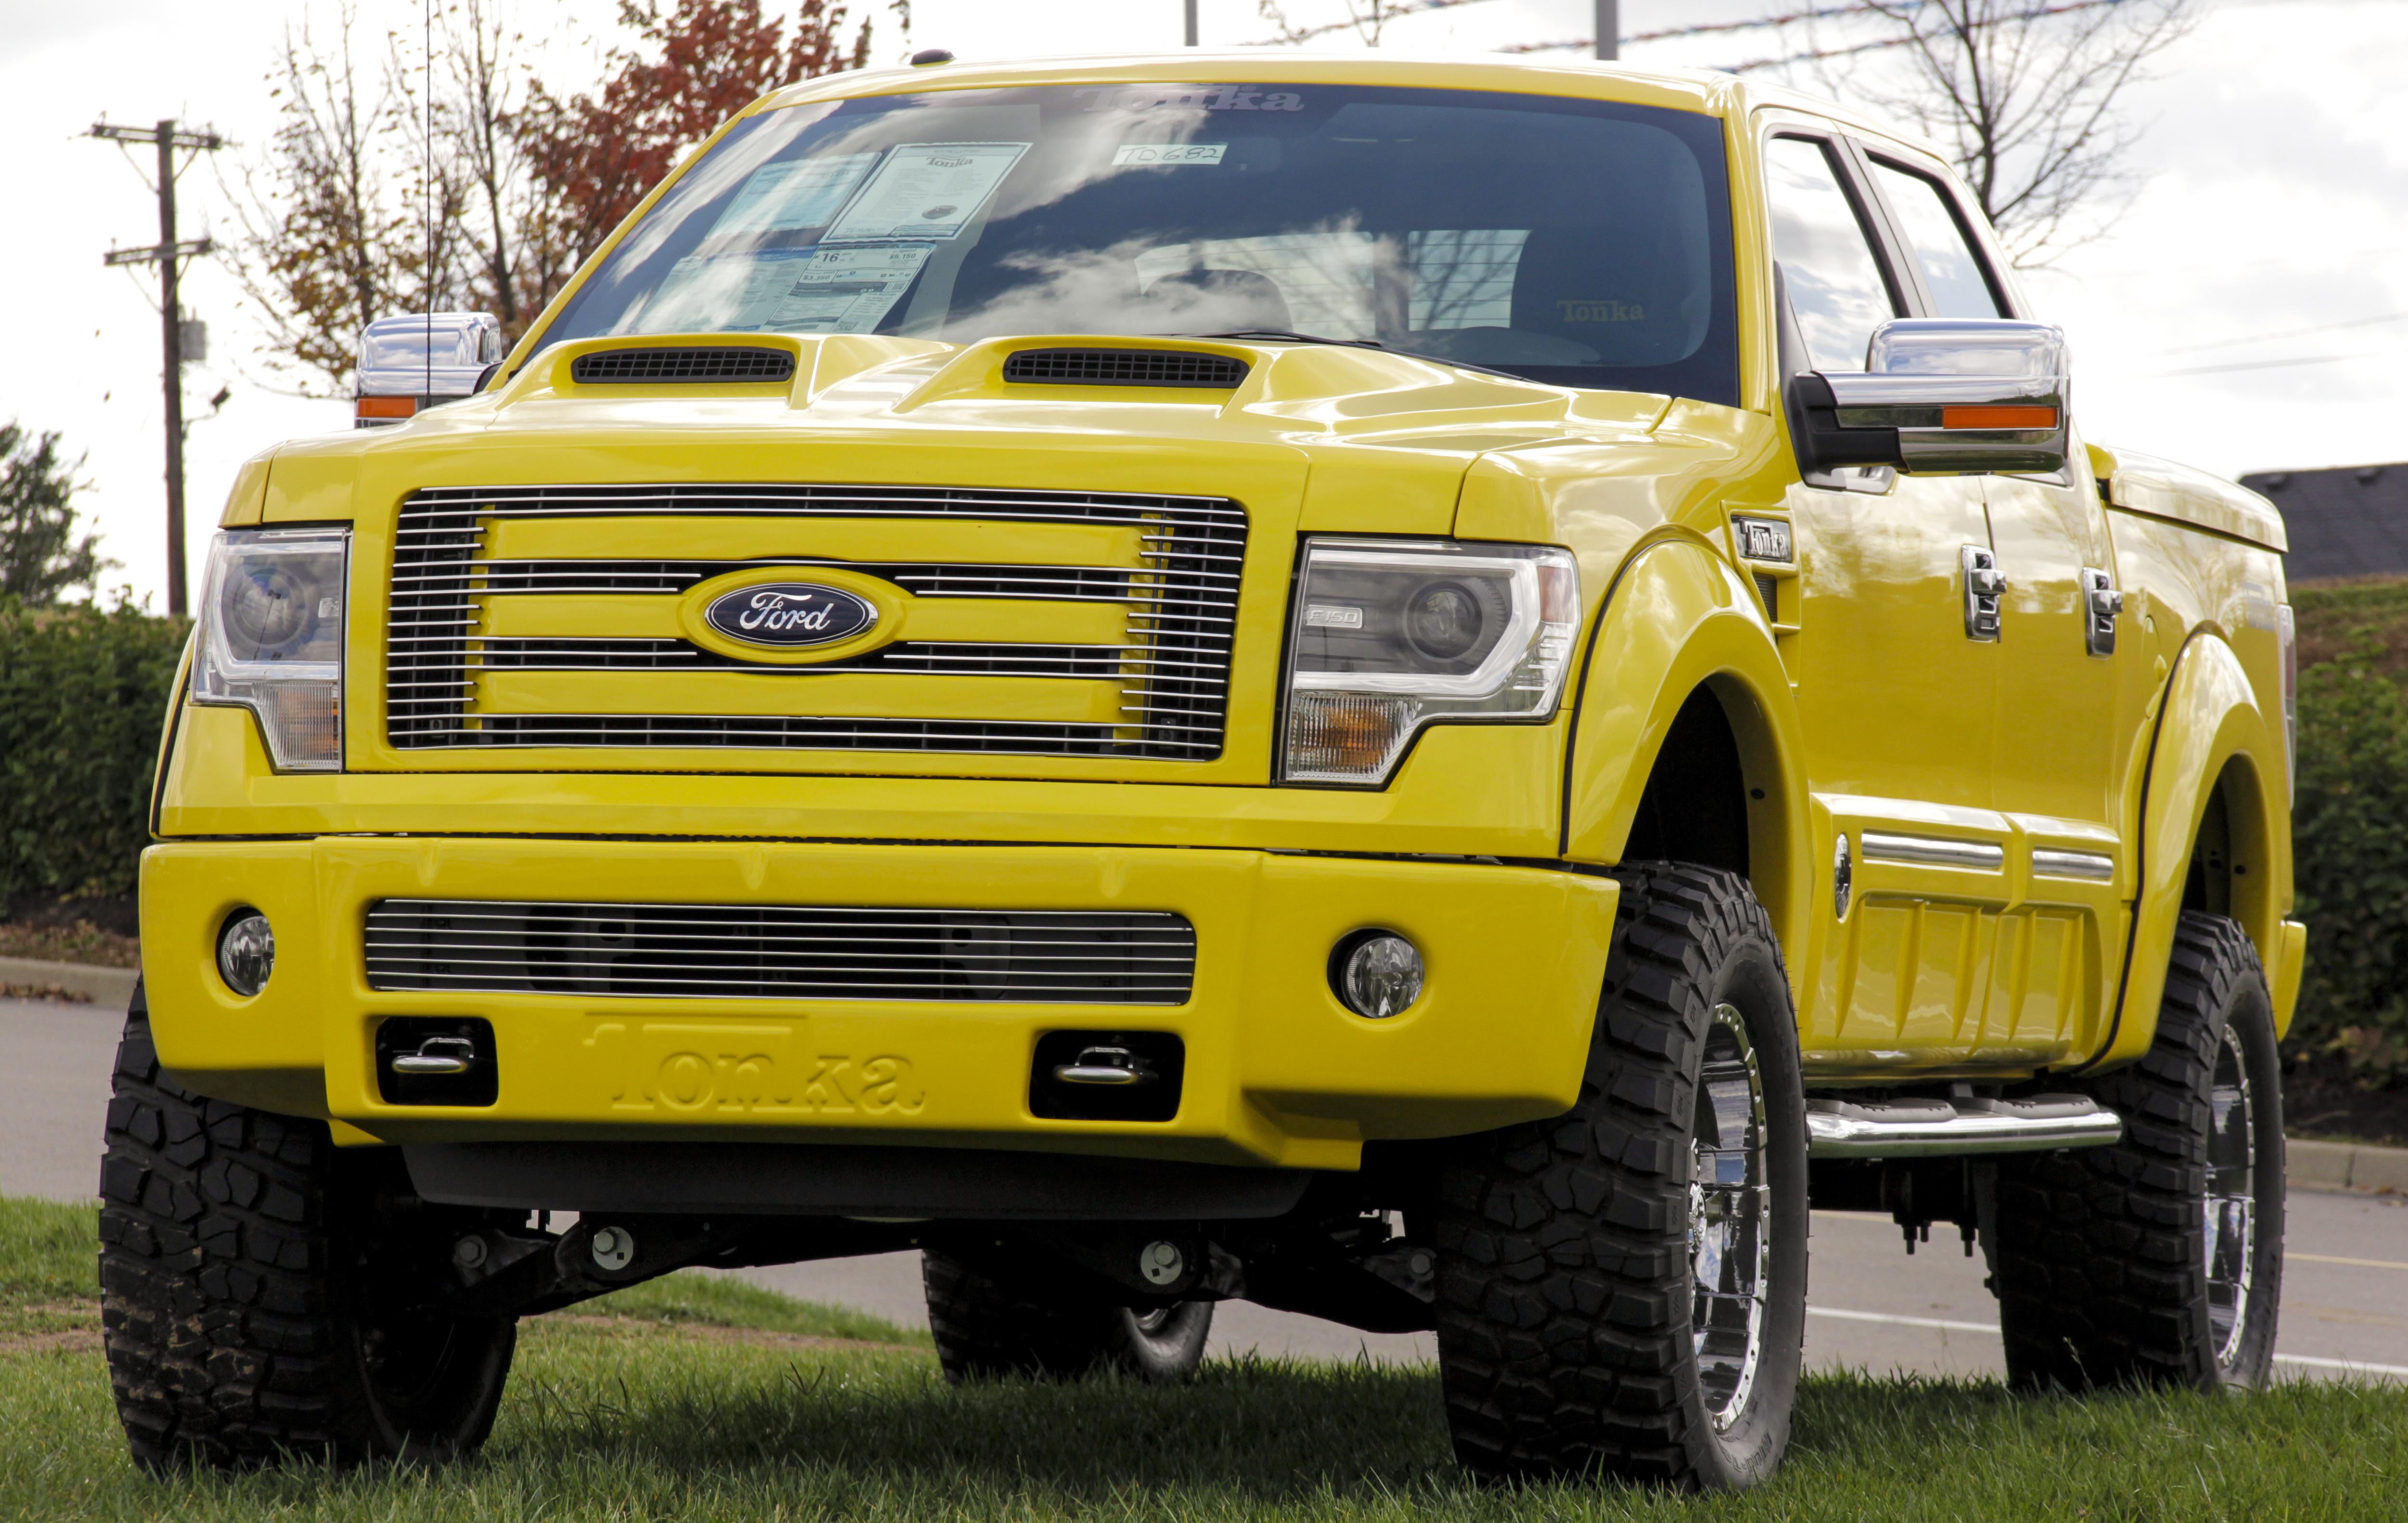 2013 ford f 150 tonka truck. Black Bedroom Furniture Sets. Home Design Ideas